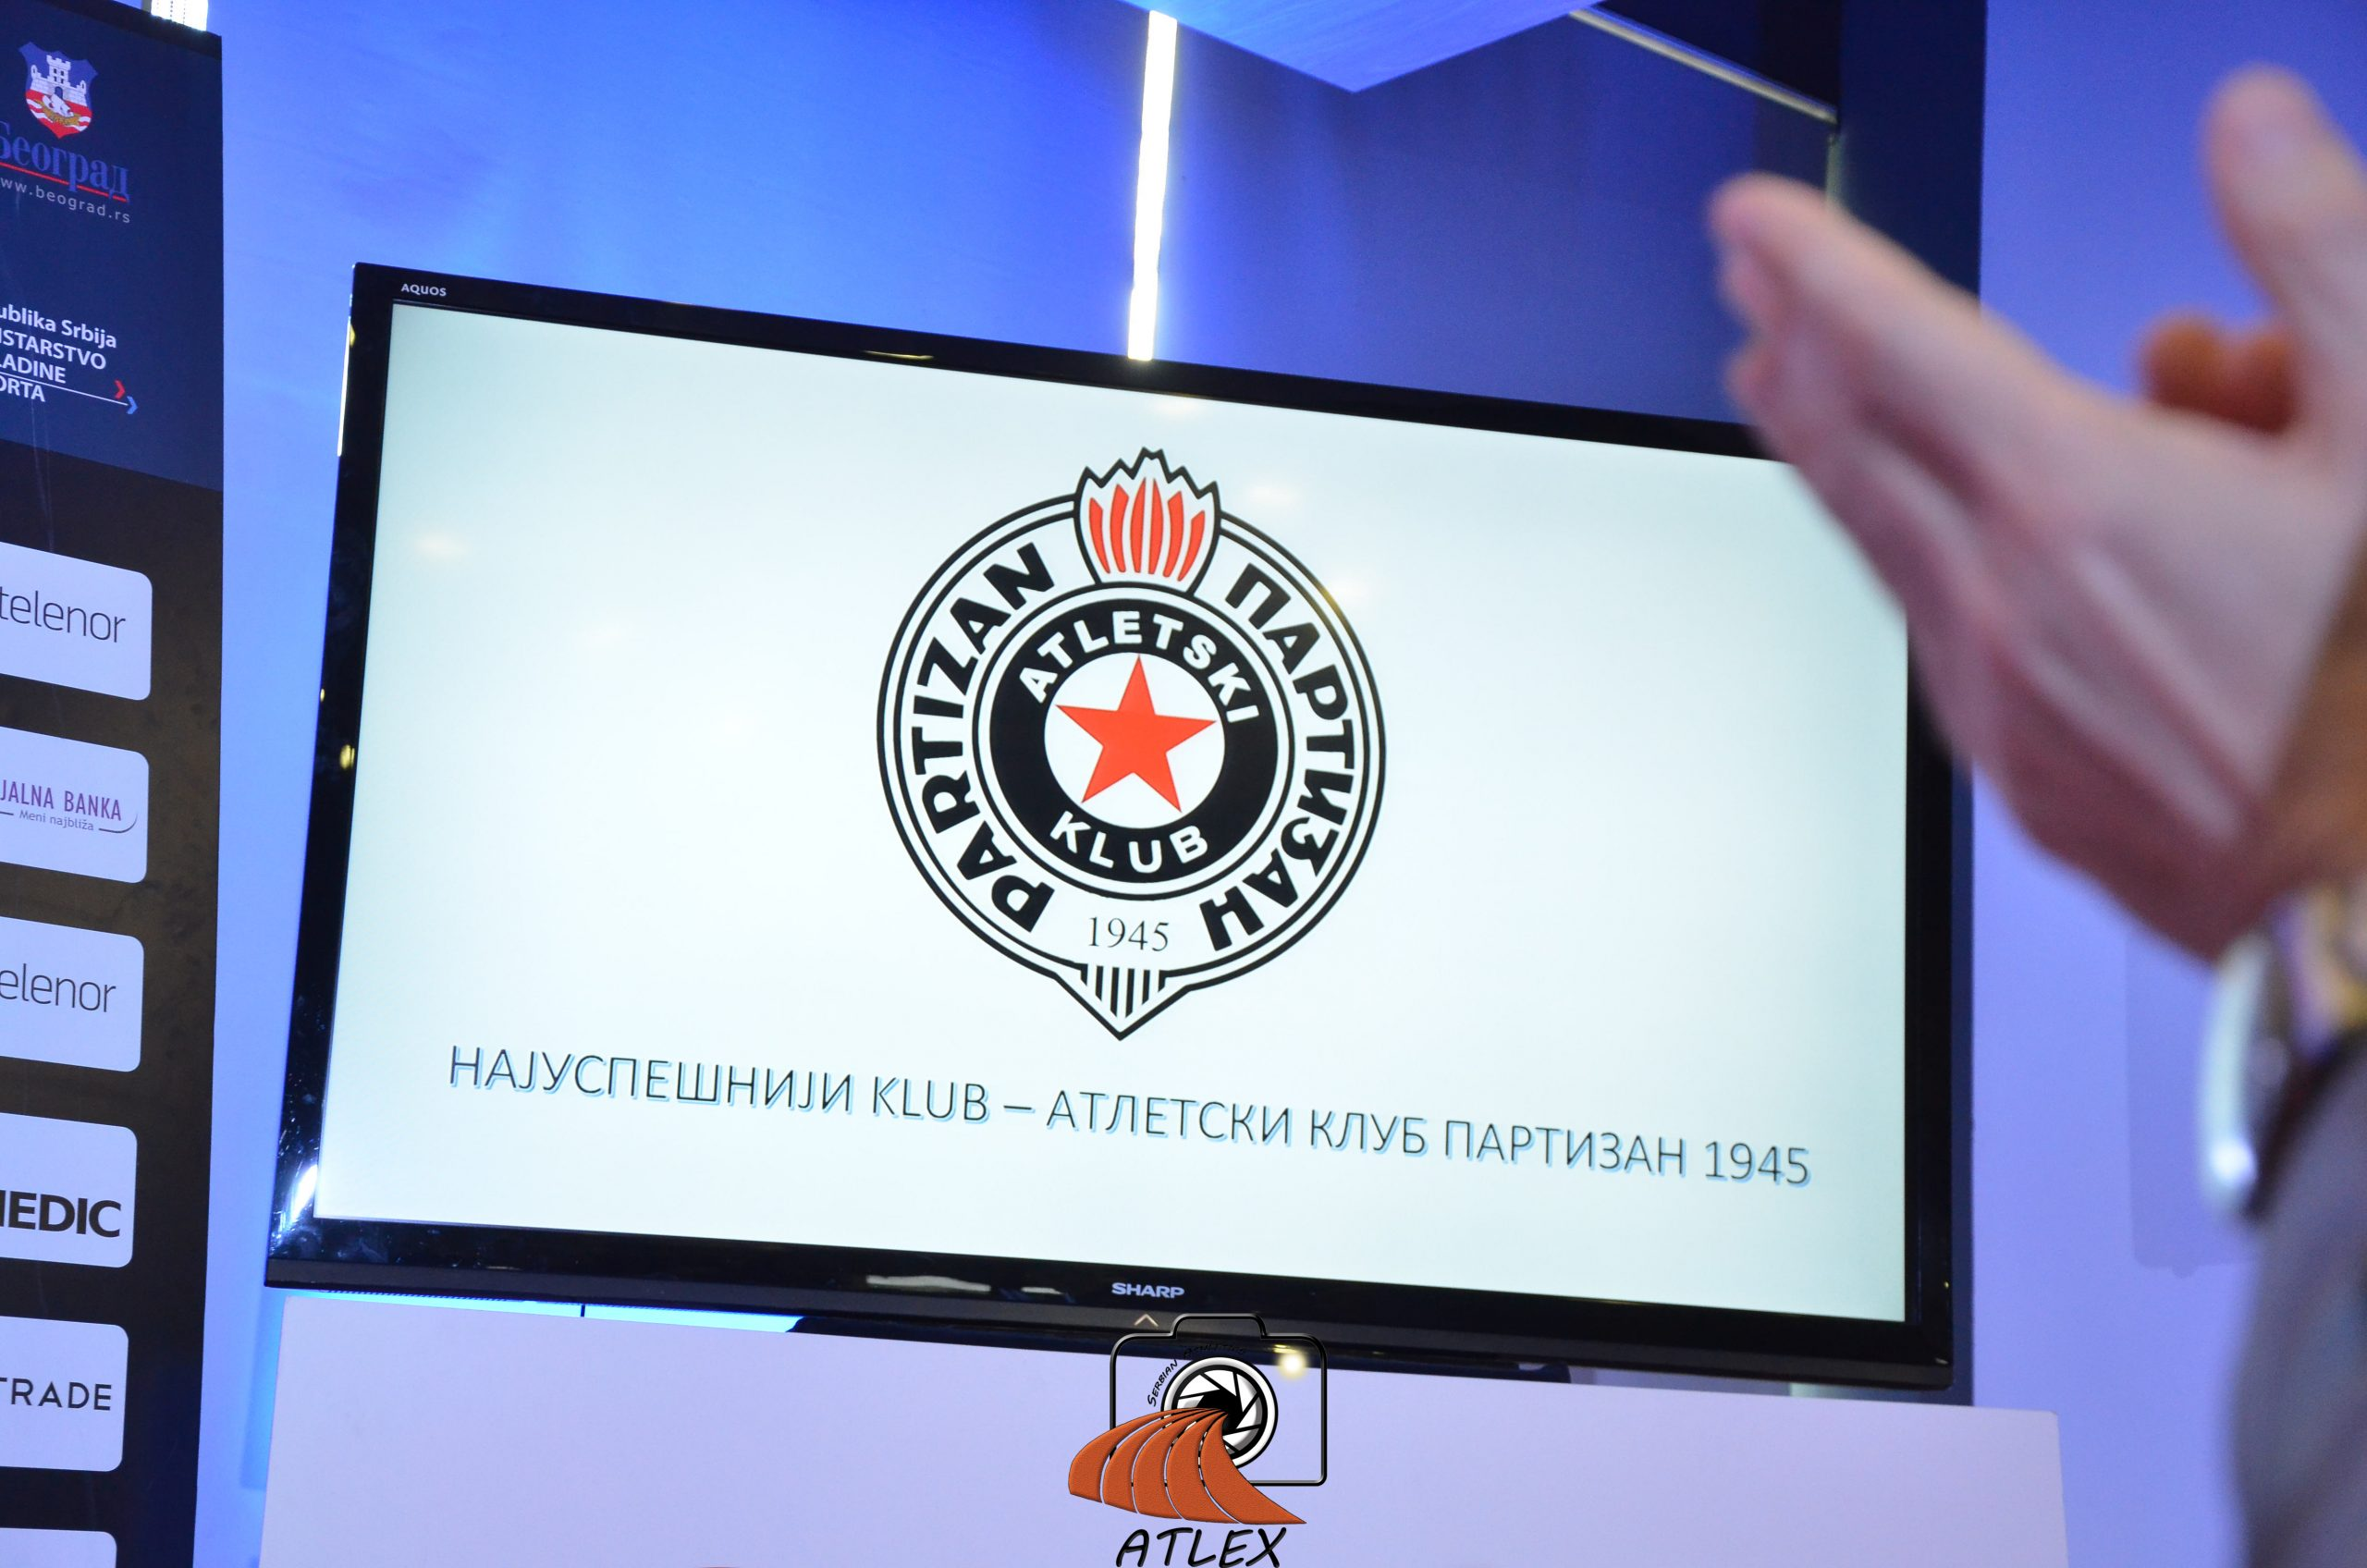 AK Partizan 1945 - Najuspešniji atletski klub u Srbiji u 2019.